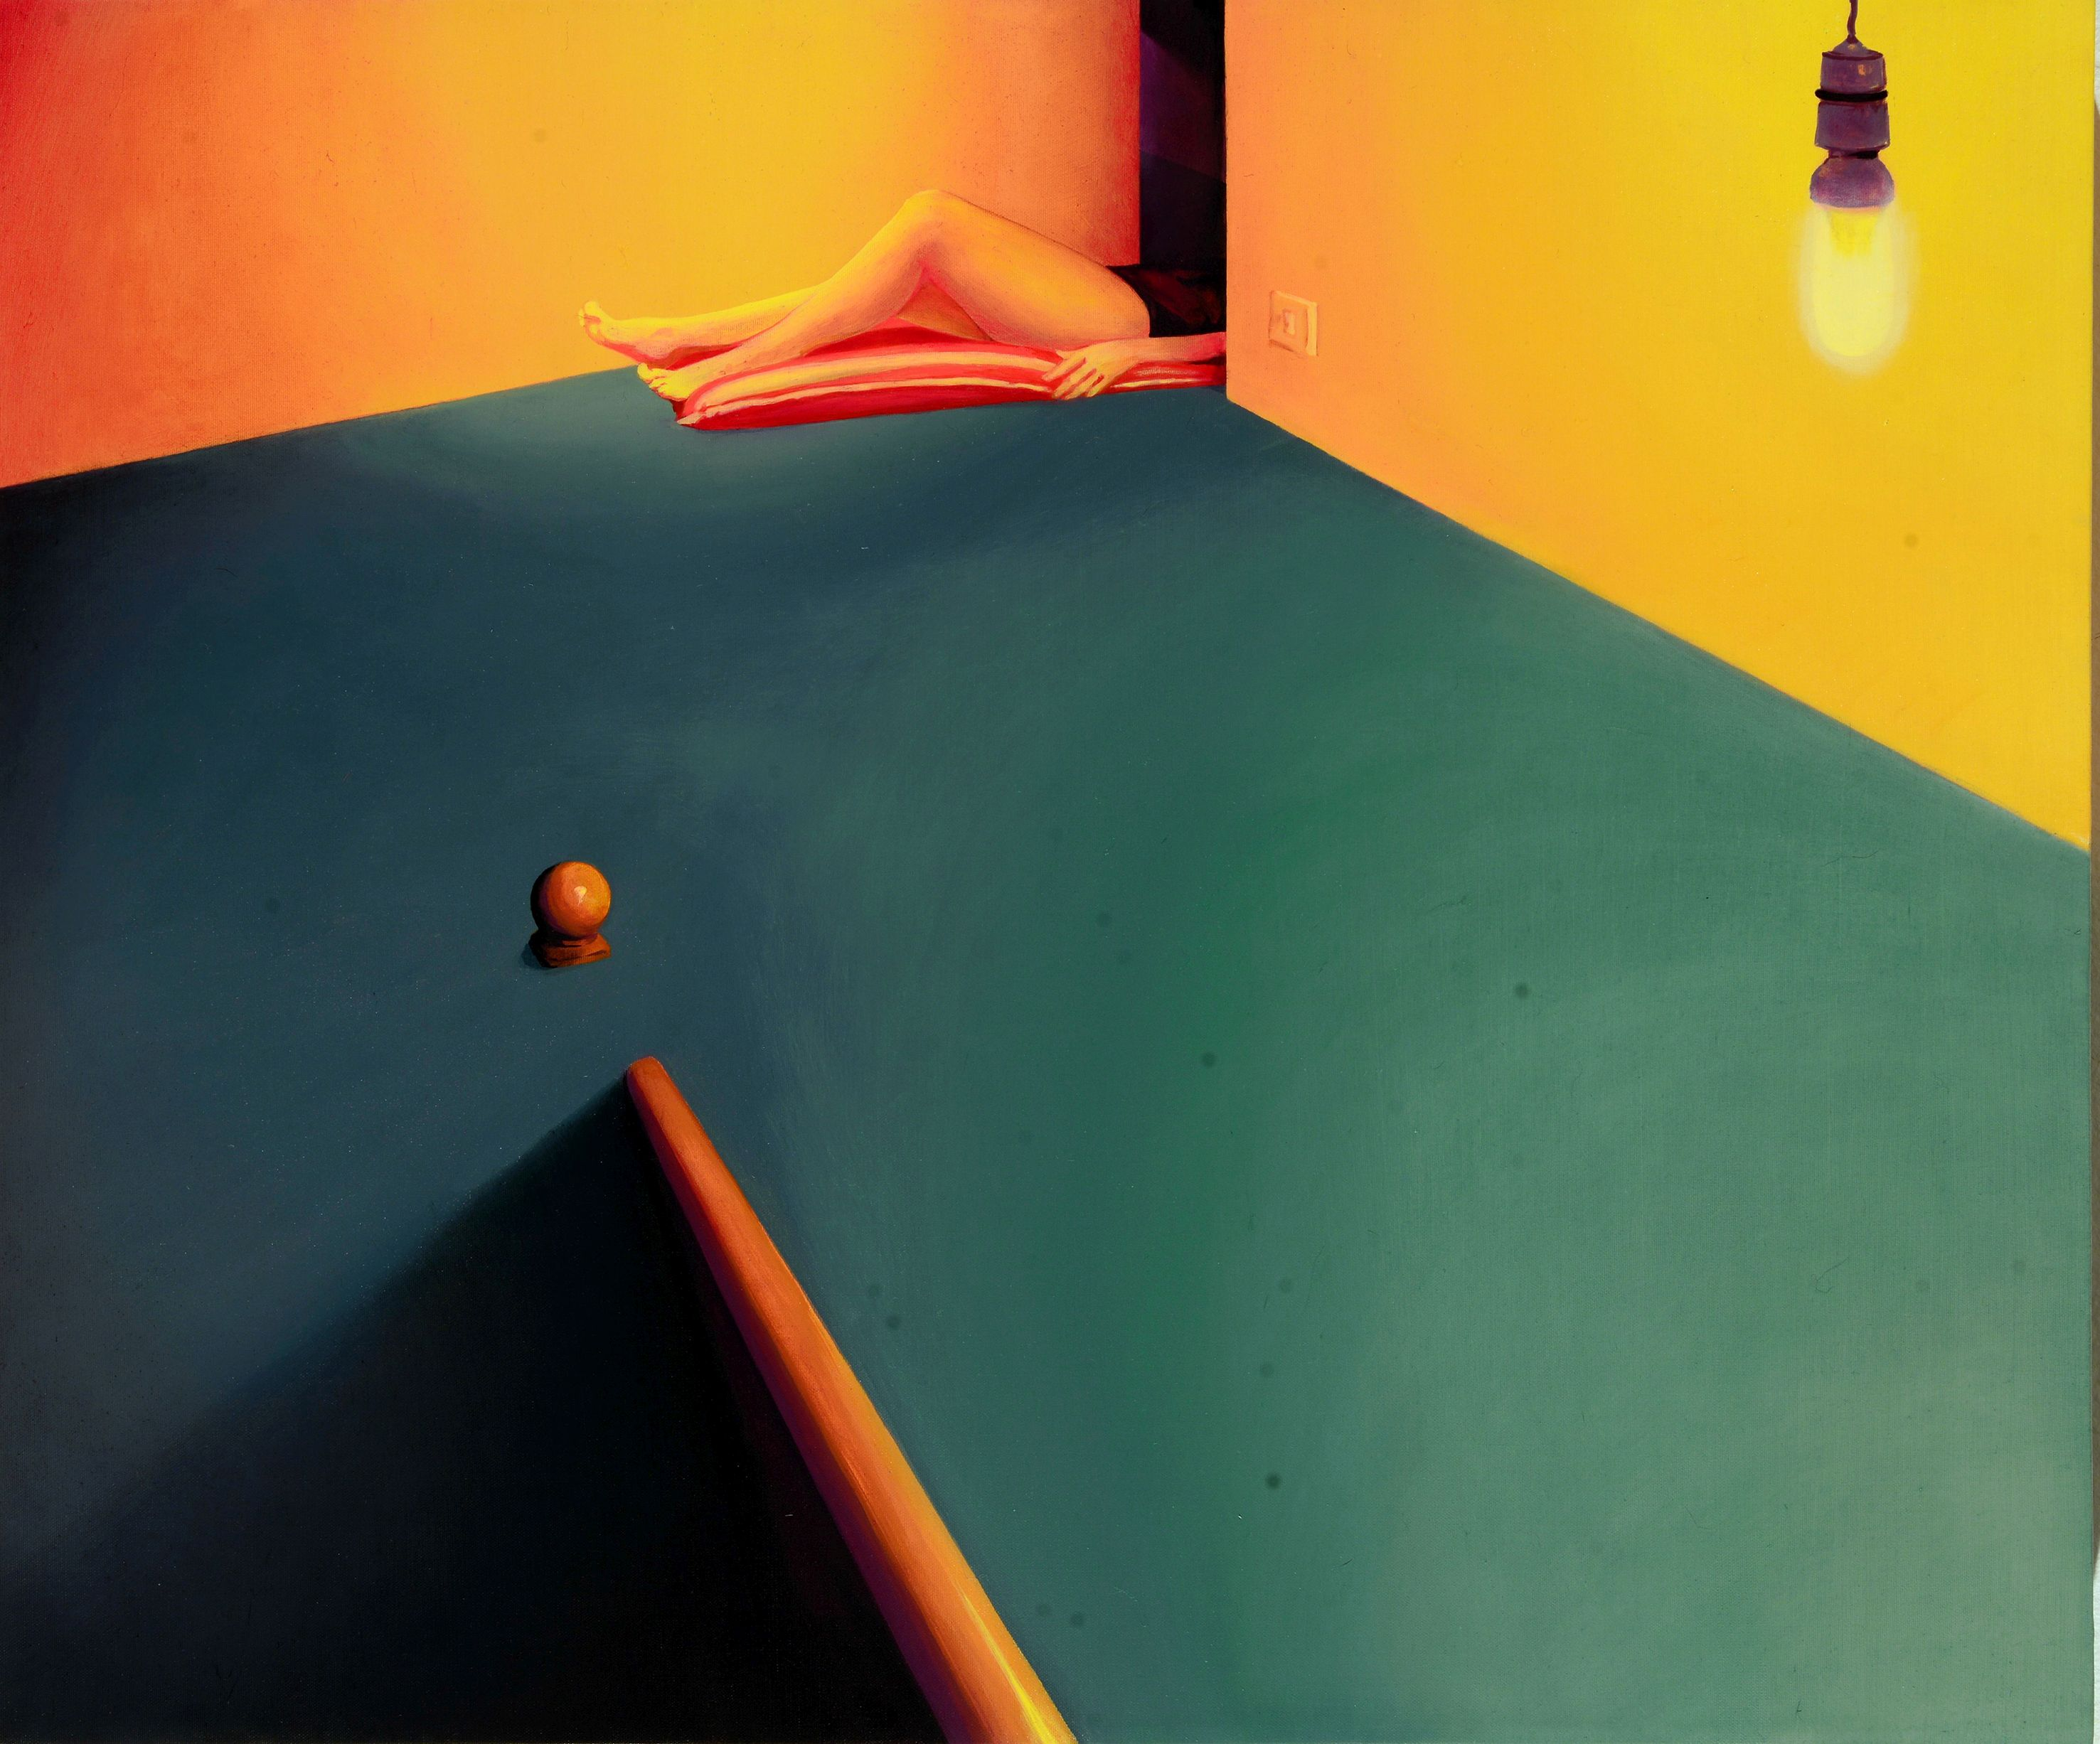 Laura Giardino, FLOOD08, 2017, tecnica mista su tela, 60x50 cm